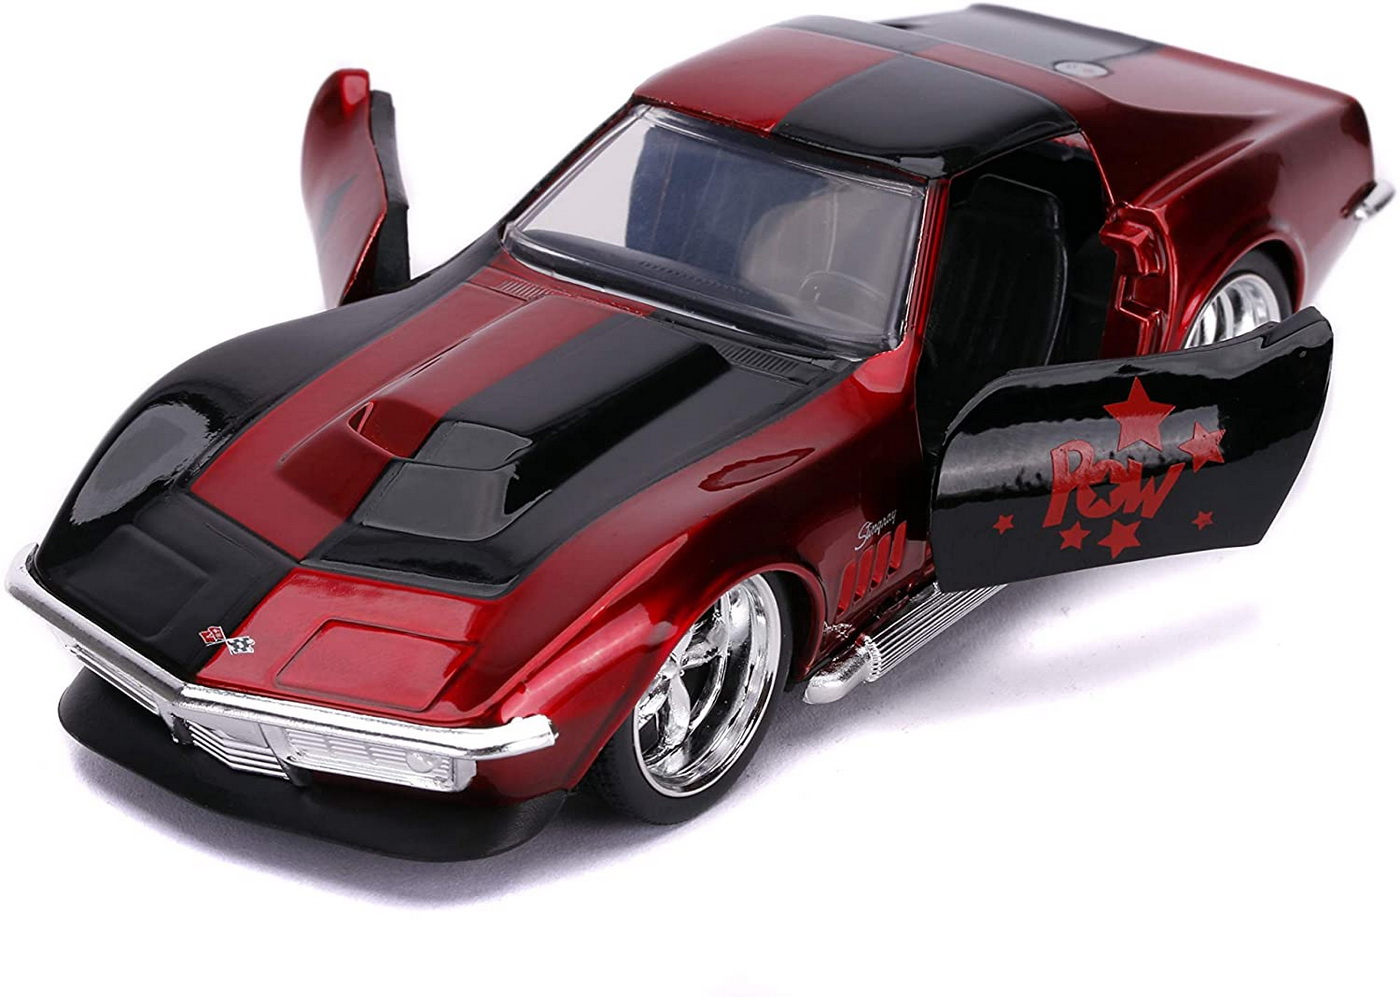 Masina Metalica Harley Quinn 1969 Corvette Stingray Scara 1 La 32 | JadaToys - 1